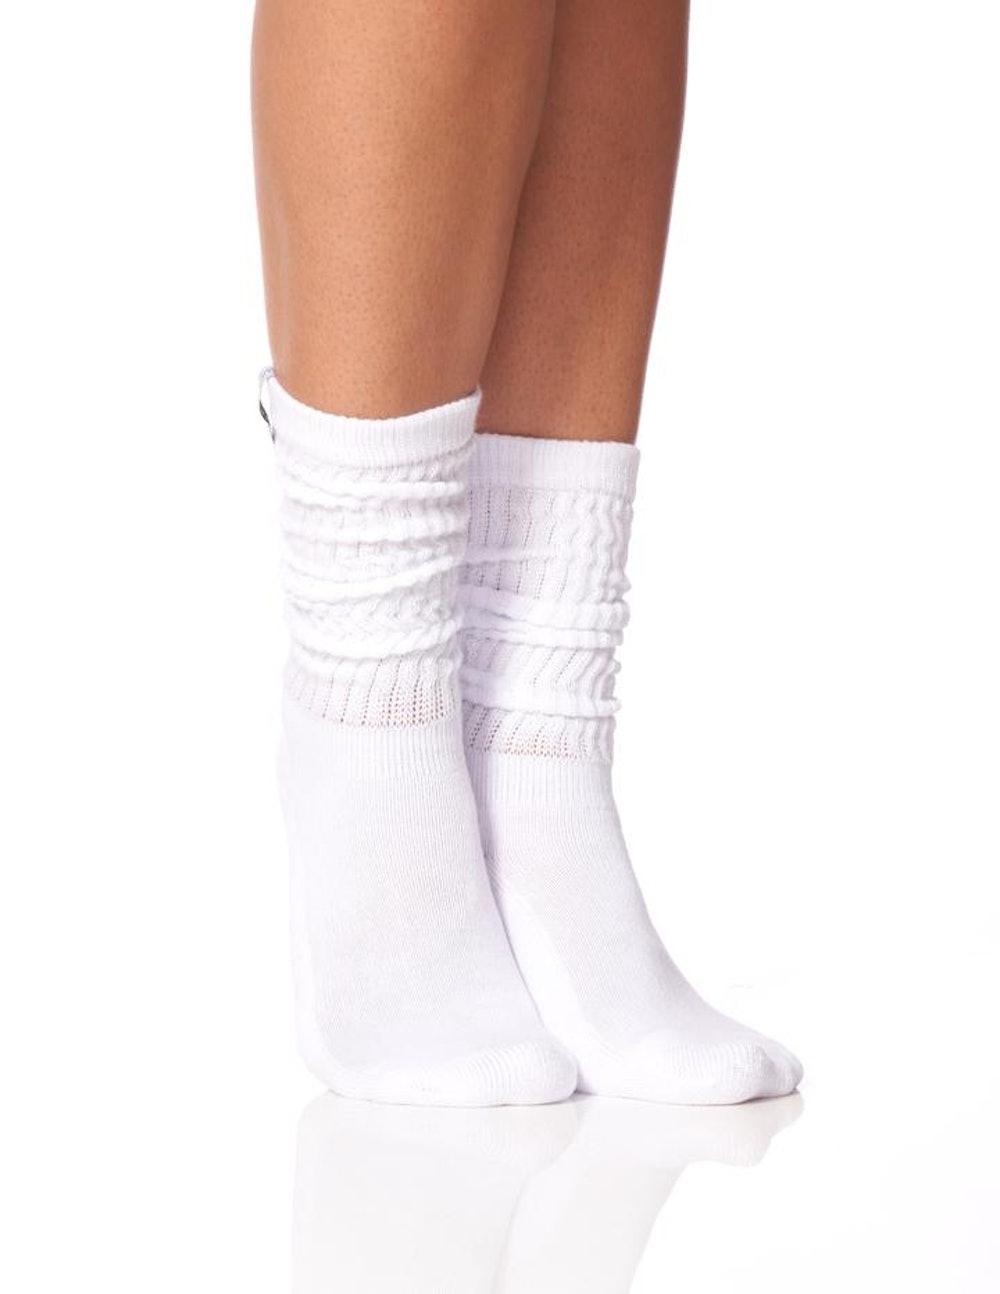 The Lightweight Scrunchie Sock